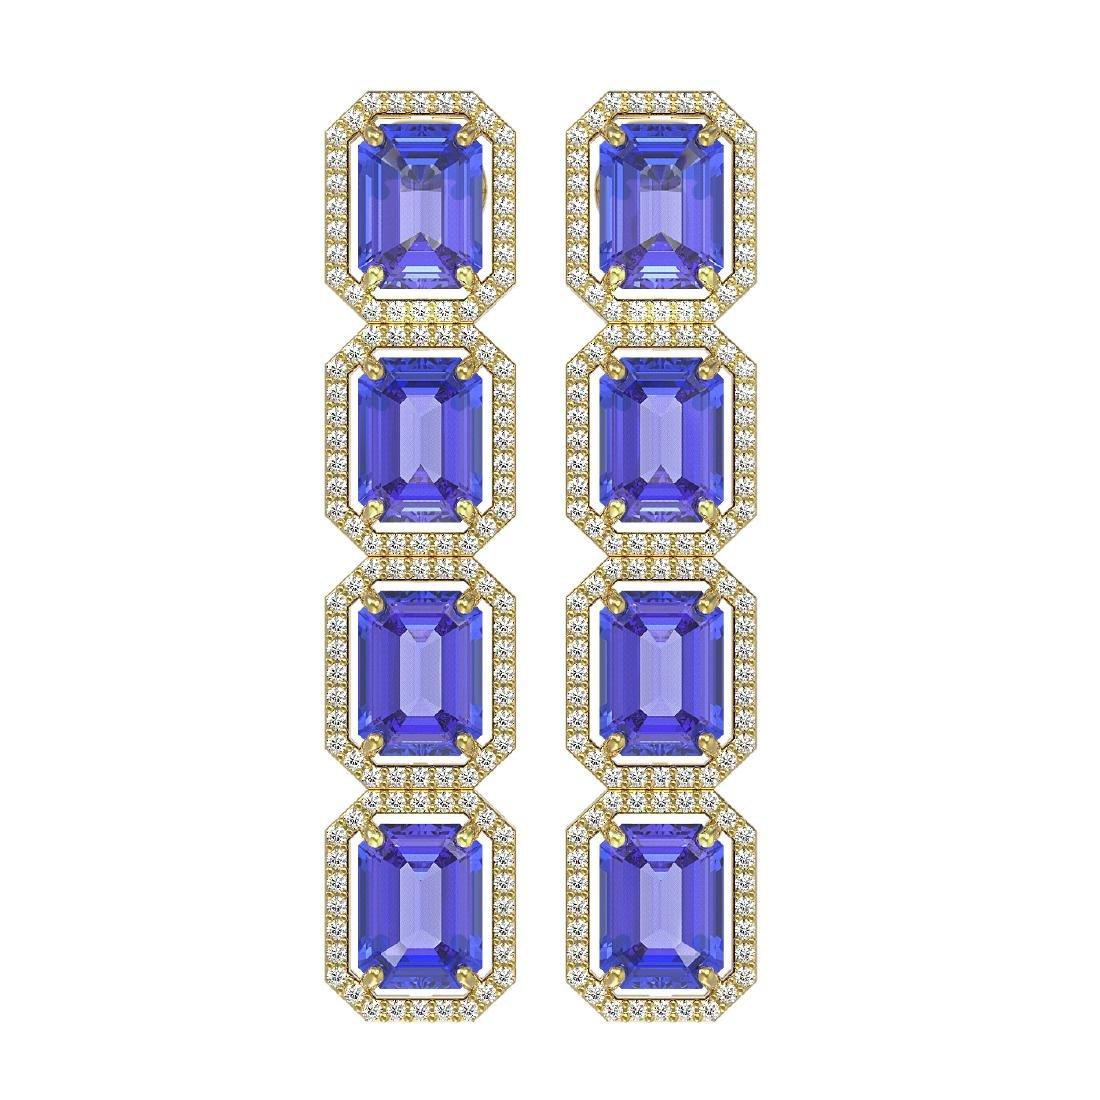 19.39 CTW Tanzanite & Diamond Halo Earrings 10K Yellow